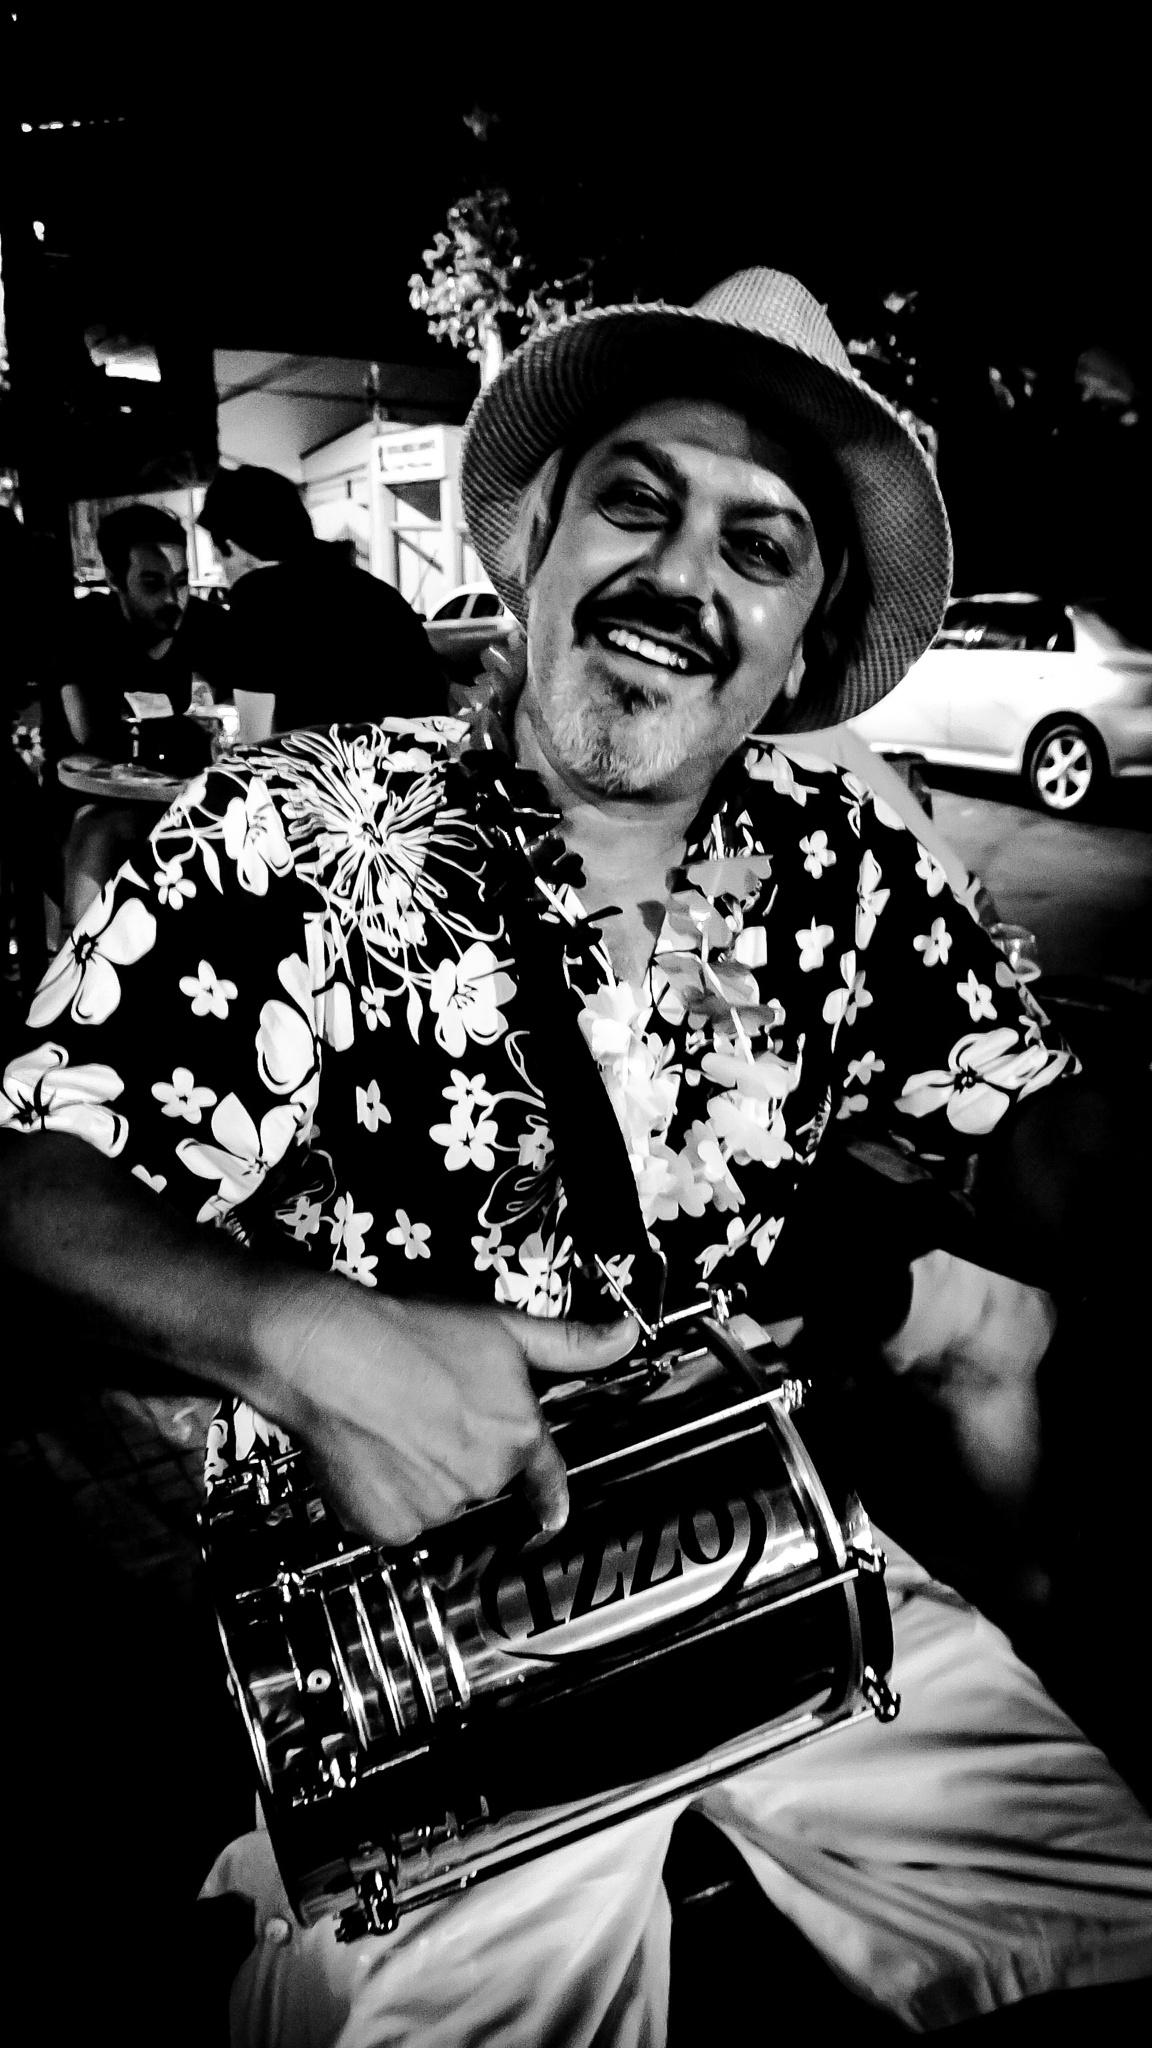 carnaval, festa da cuica. Carnival, party cuica  by xande.rachid